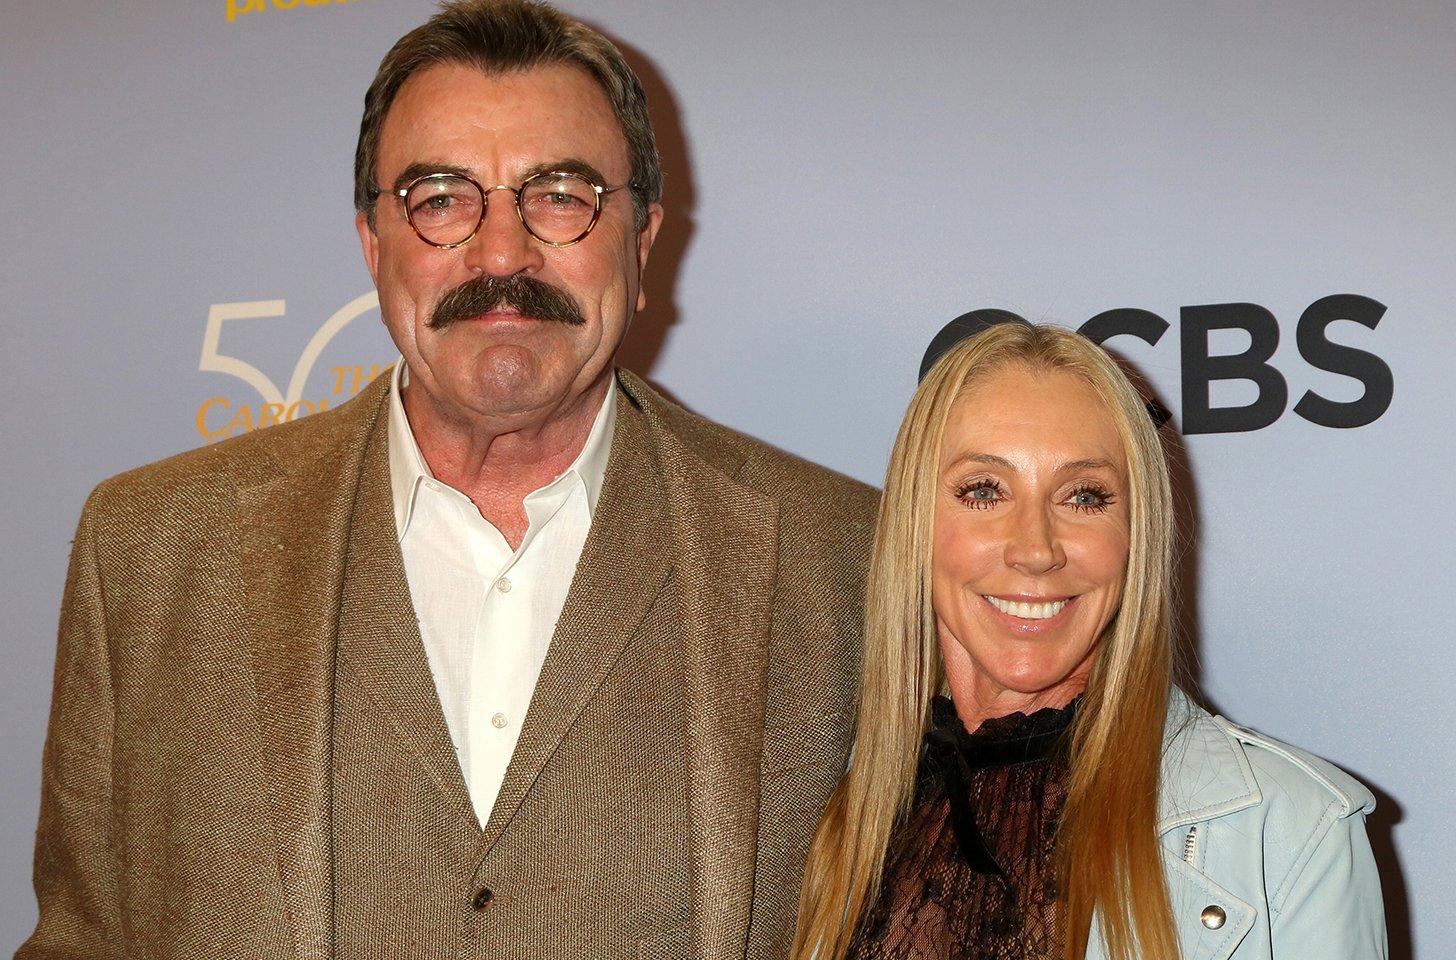 Tom Selleck And Jillie Mack Living Separate Lives?